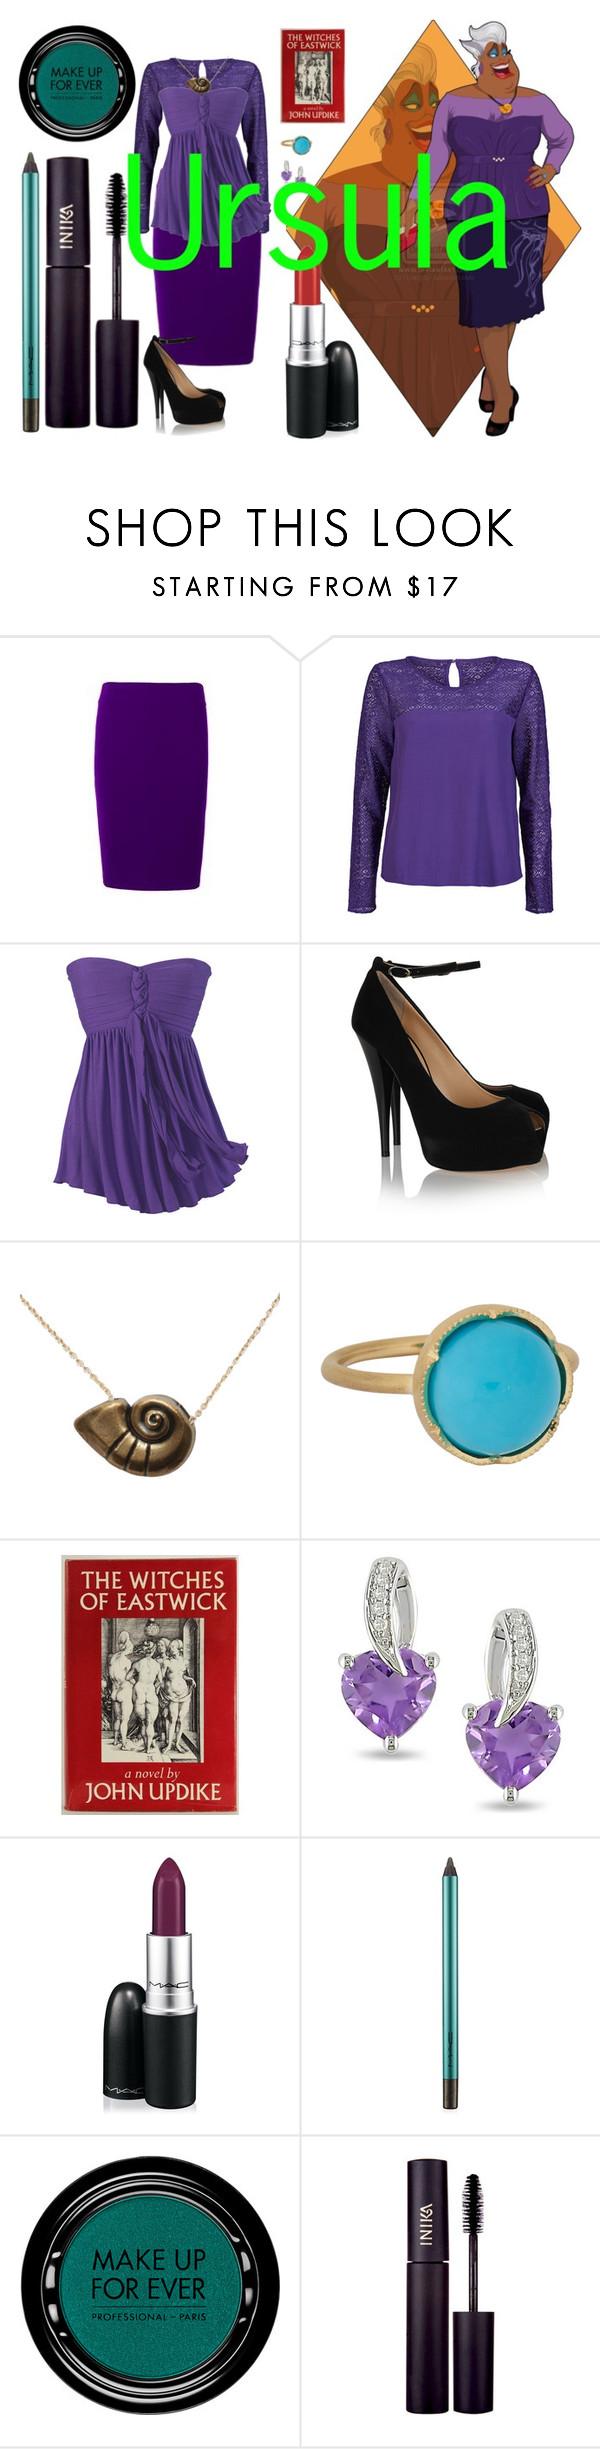 """Ursula's Style"" by bambolinadicarta ❤ liked on Polyvore featuring Disney, ONLY, Giuseppe Zanotti, Irene Neuwirth, Ice, MAC Cosmetics, MAKE UP FOR EVER, INIKA, disney and ursula"